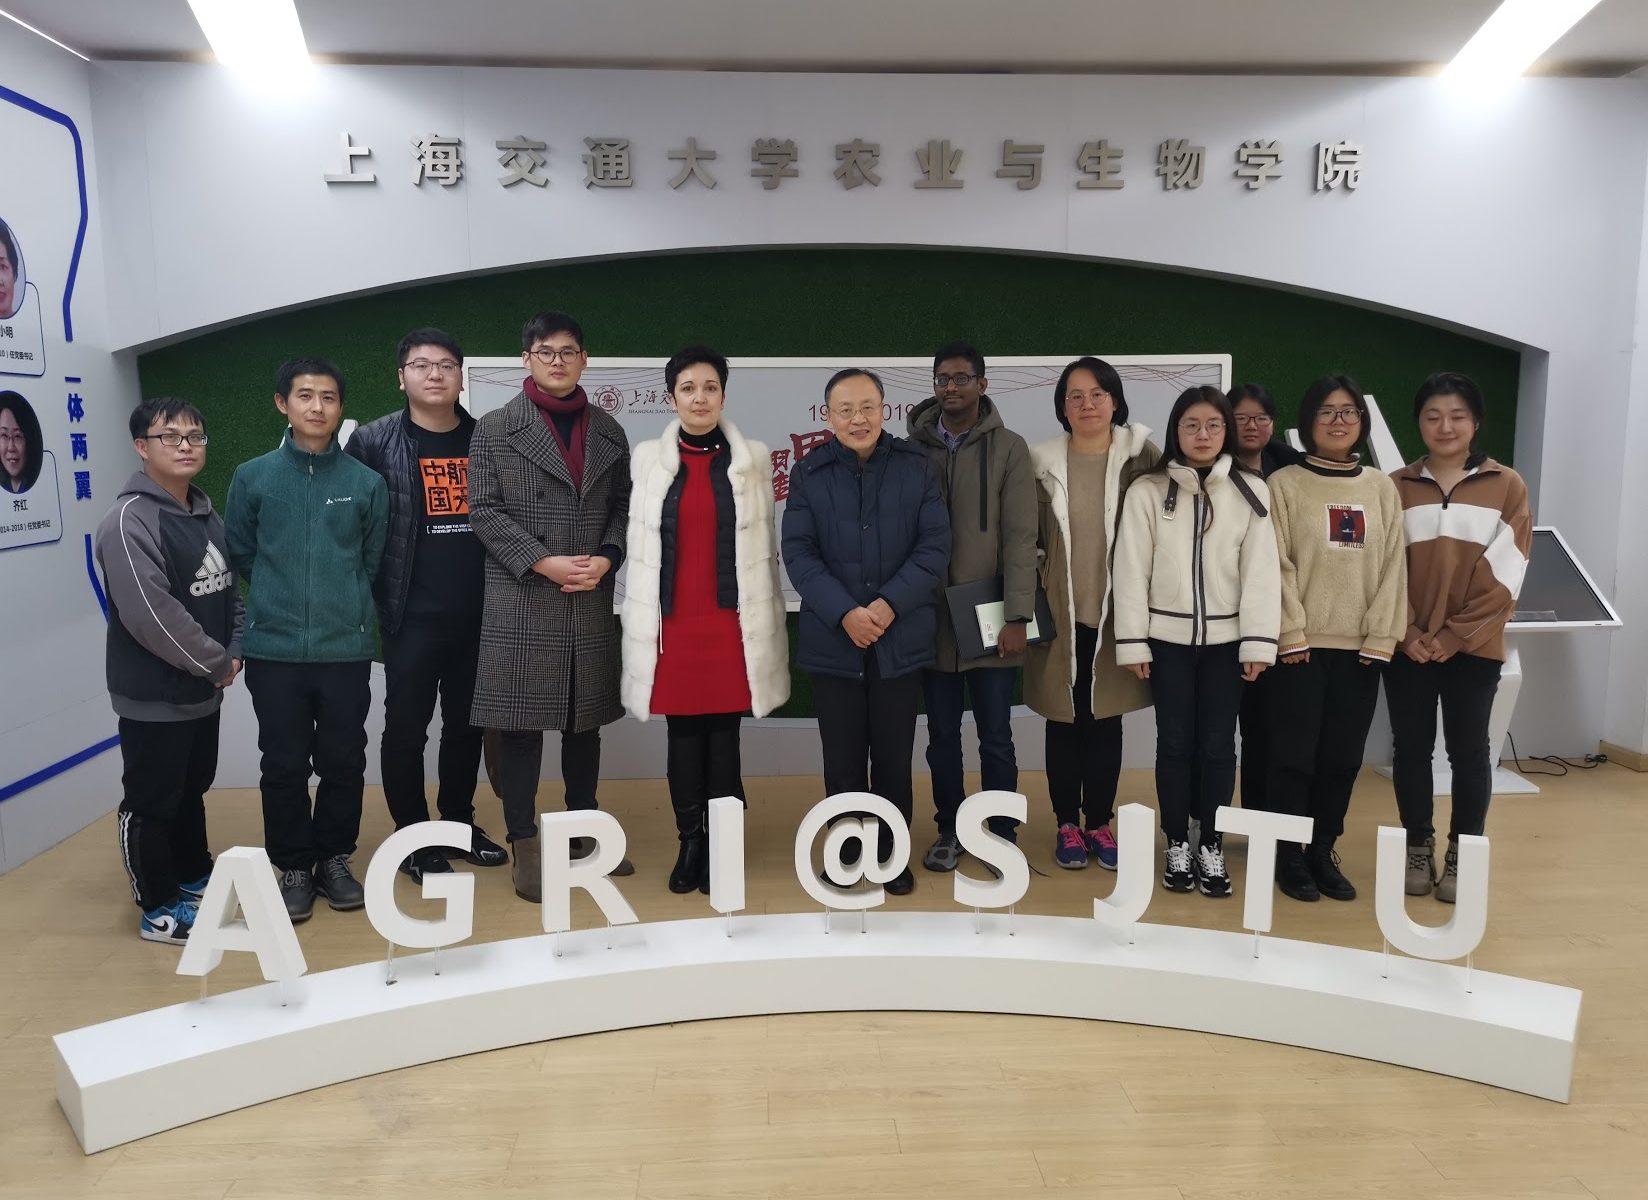 Irina S. Druzhinina and Feng Cai visirting Shanghai Jiaotong University, December 25, 2020